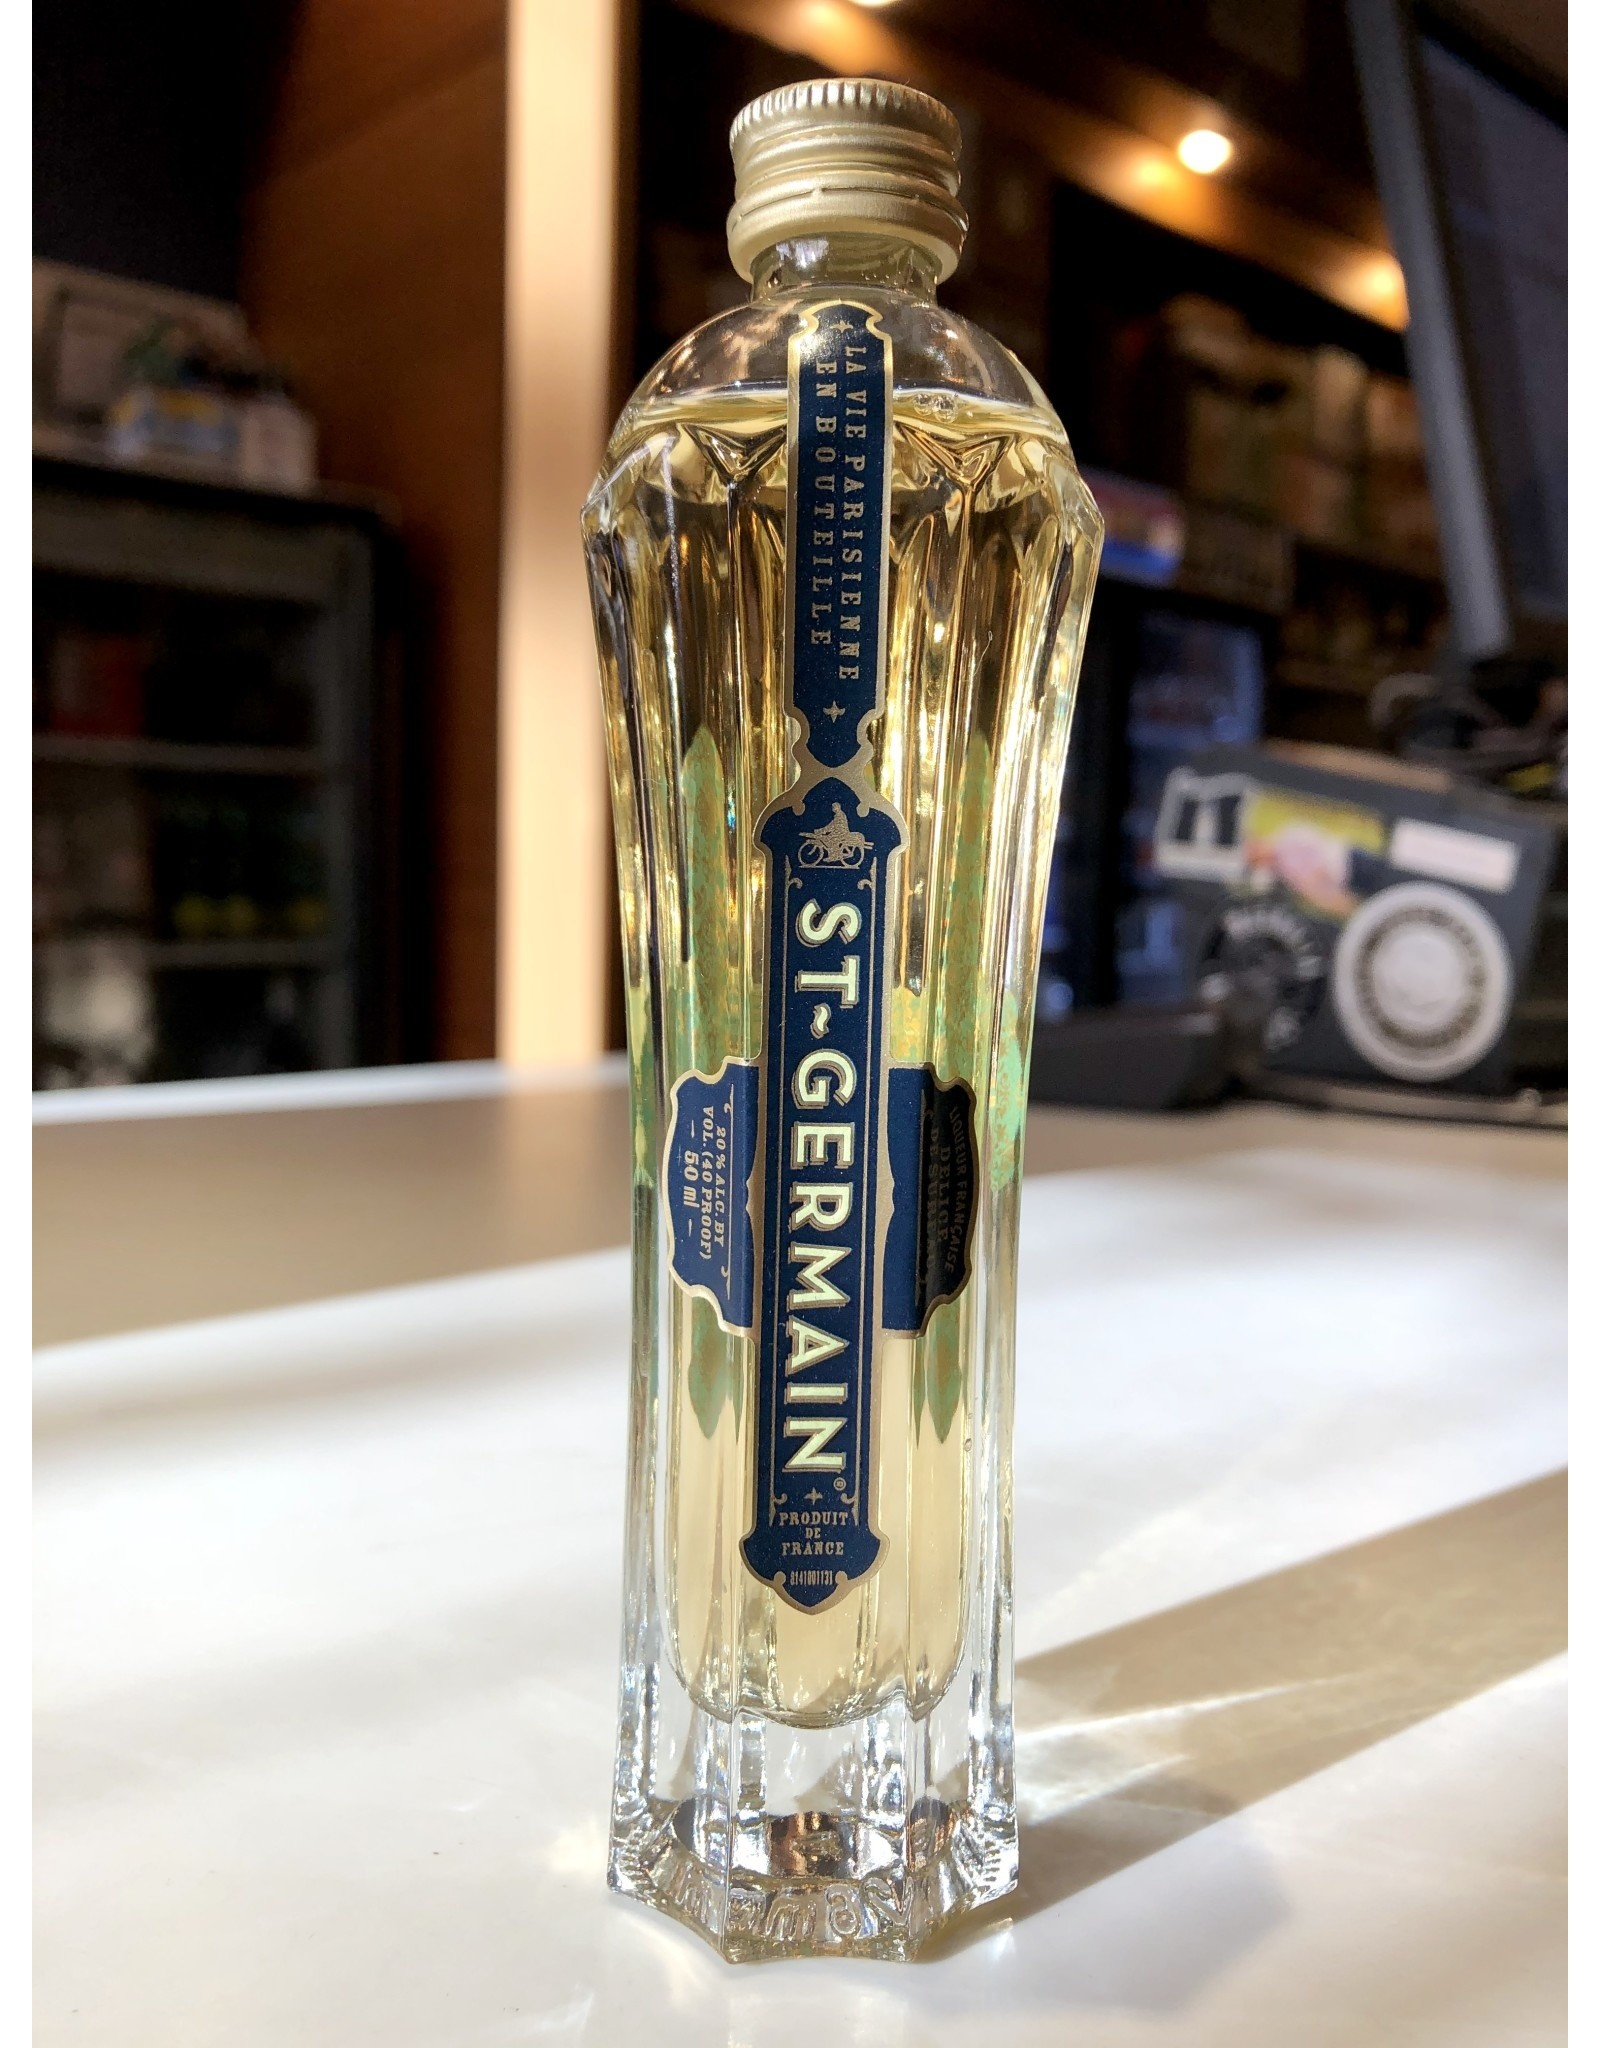 St Germain - 50 ML